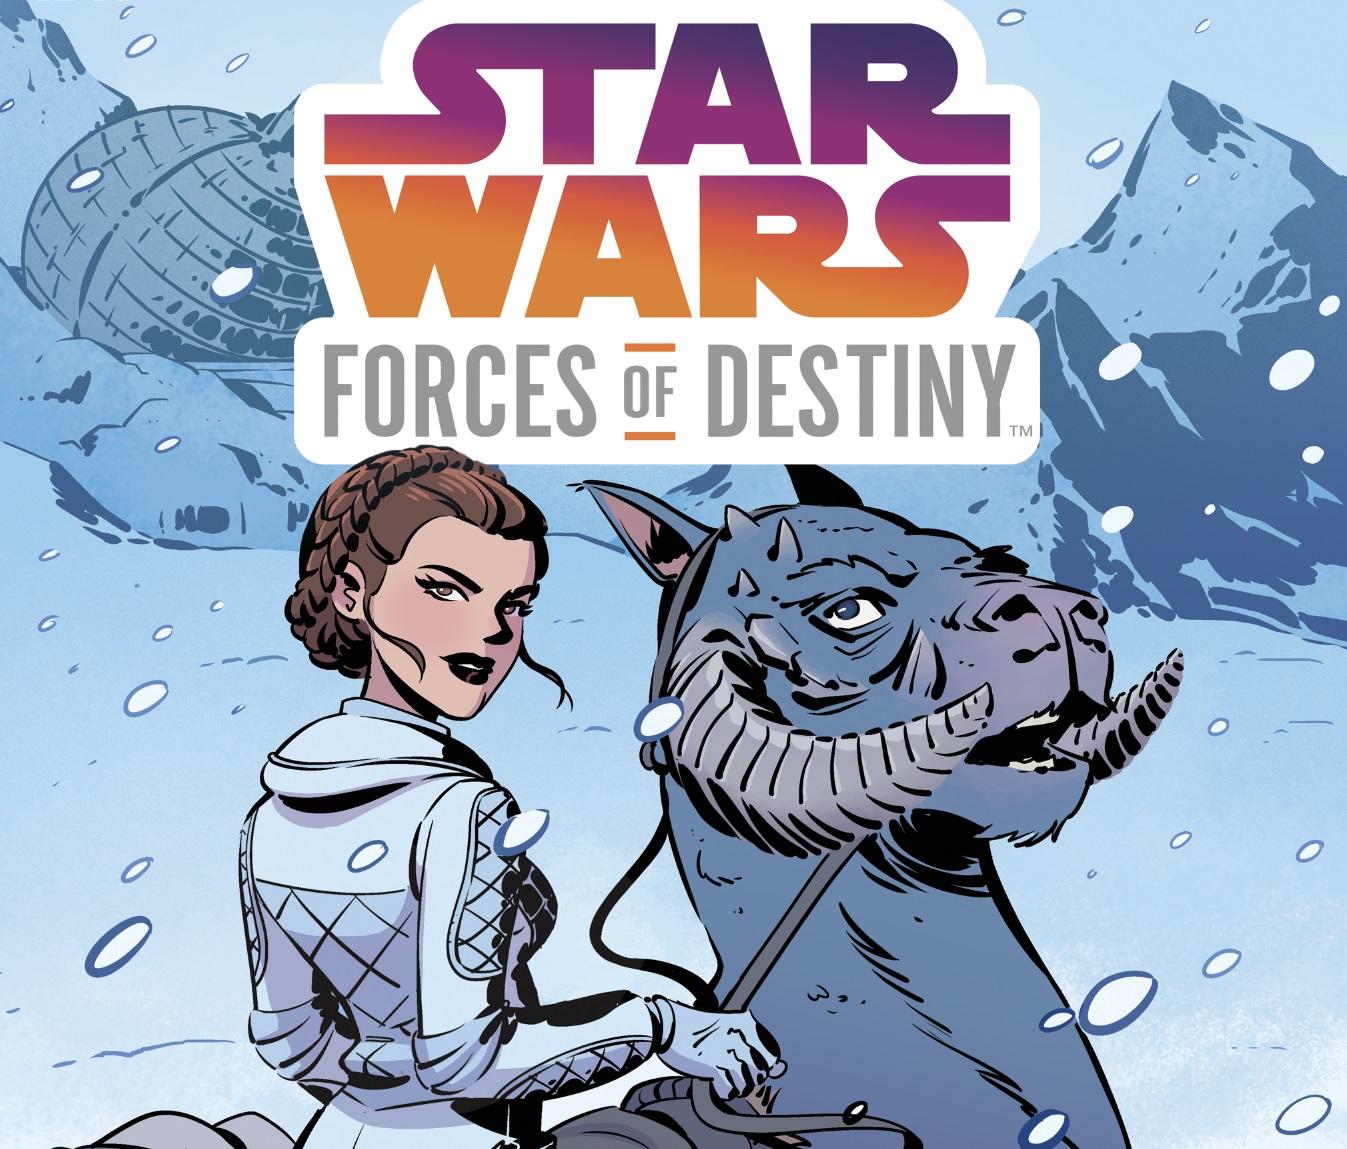 Leia Forces od Destiny IDW evidenza